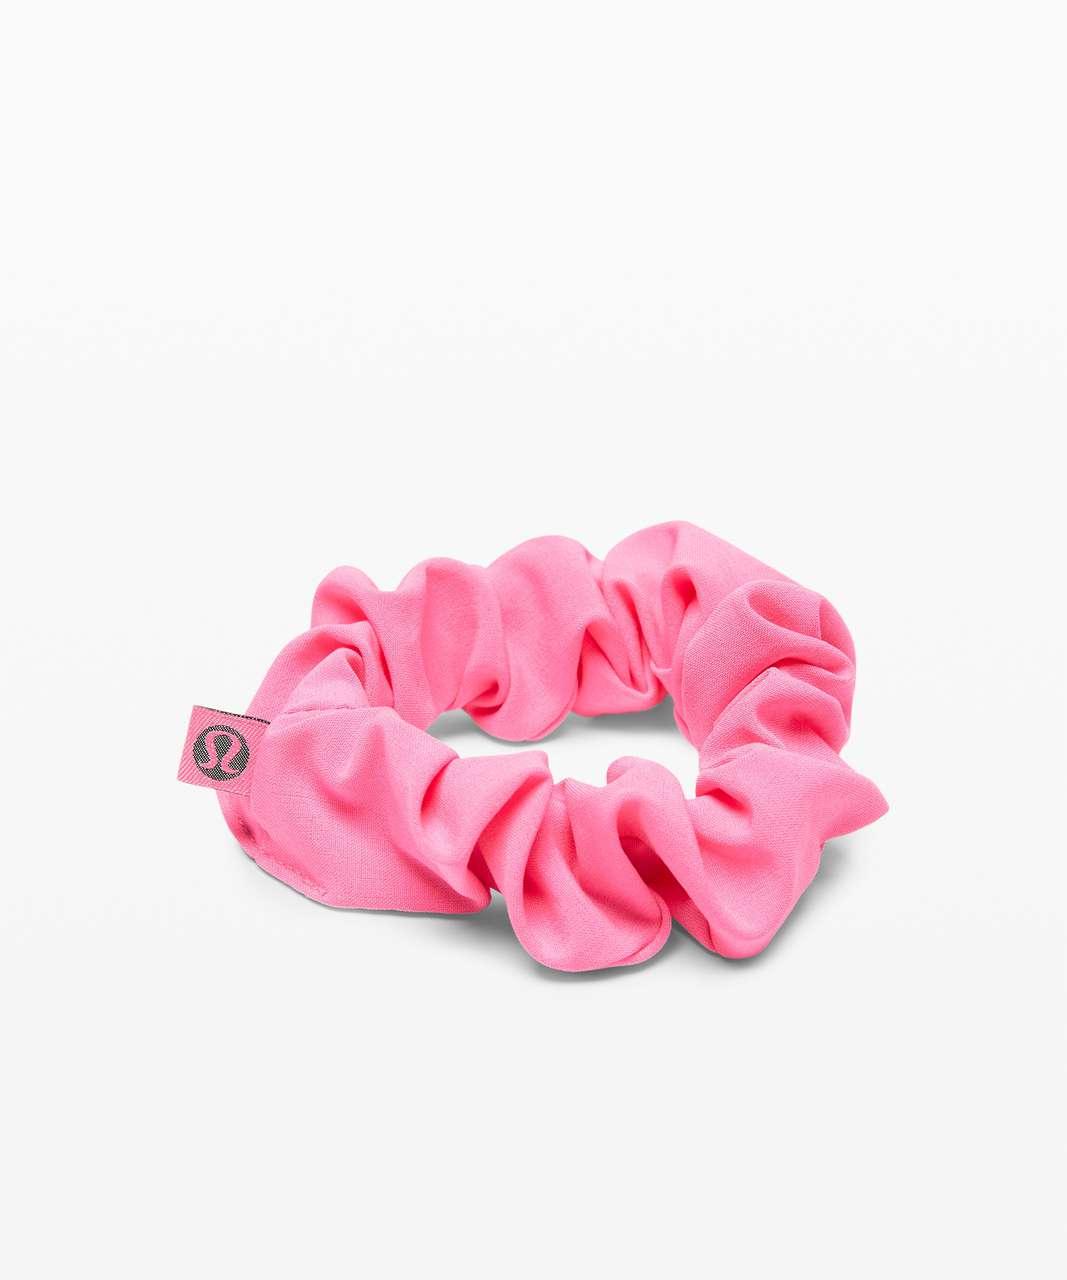 Lululemon Uplifting Scrunchie - Dark Prism Pink